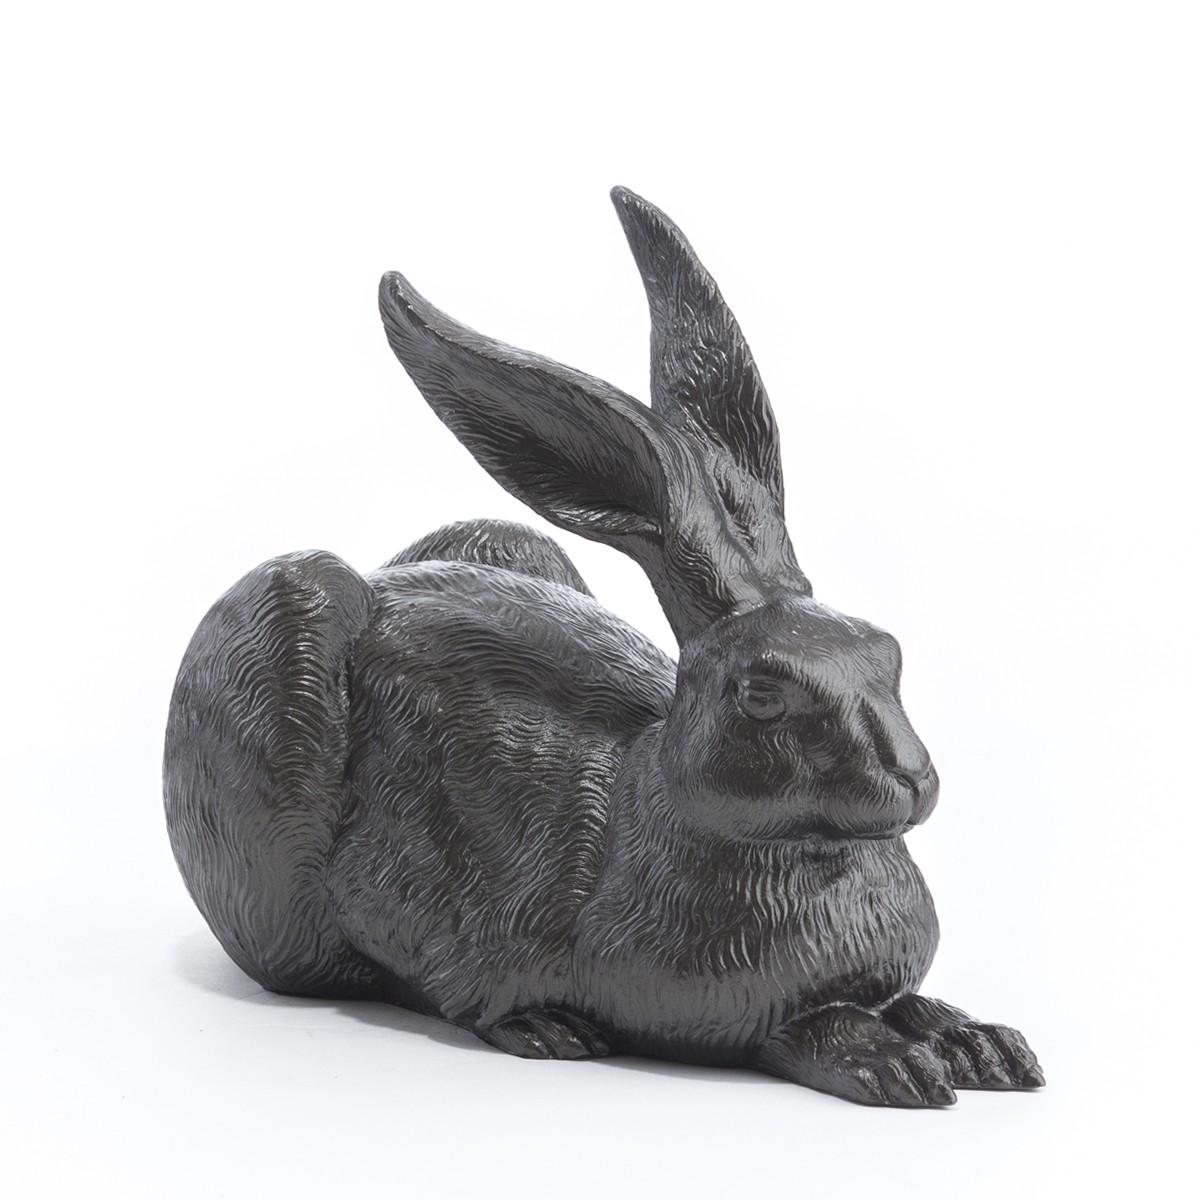 Dürer-Hase, bronze - Hörl, Ottmar - k-HH-bro